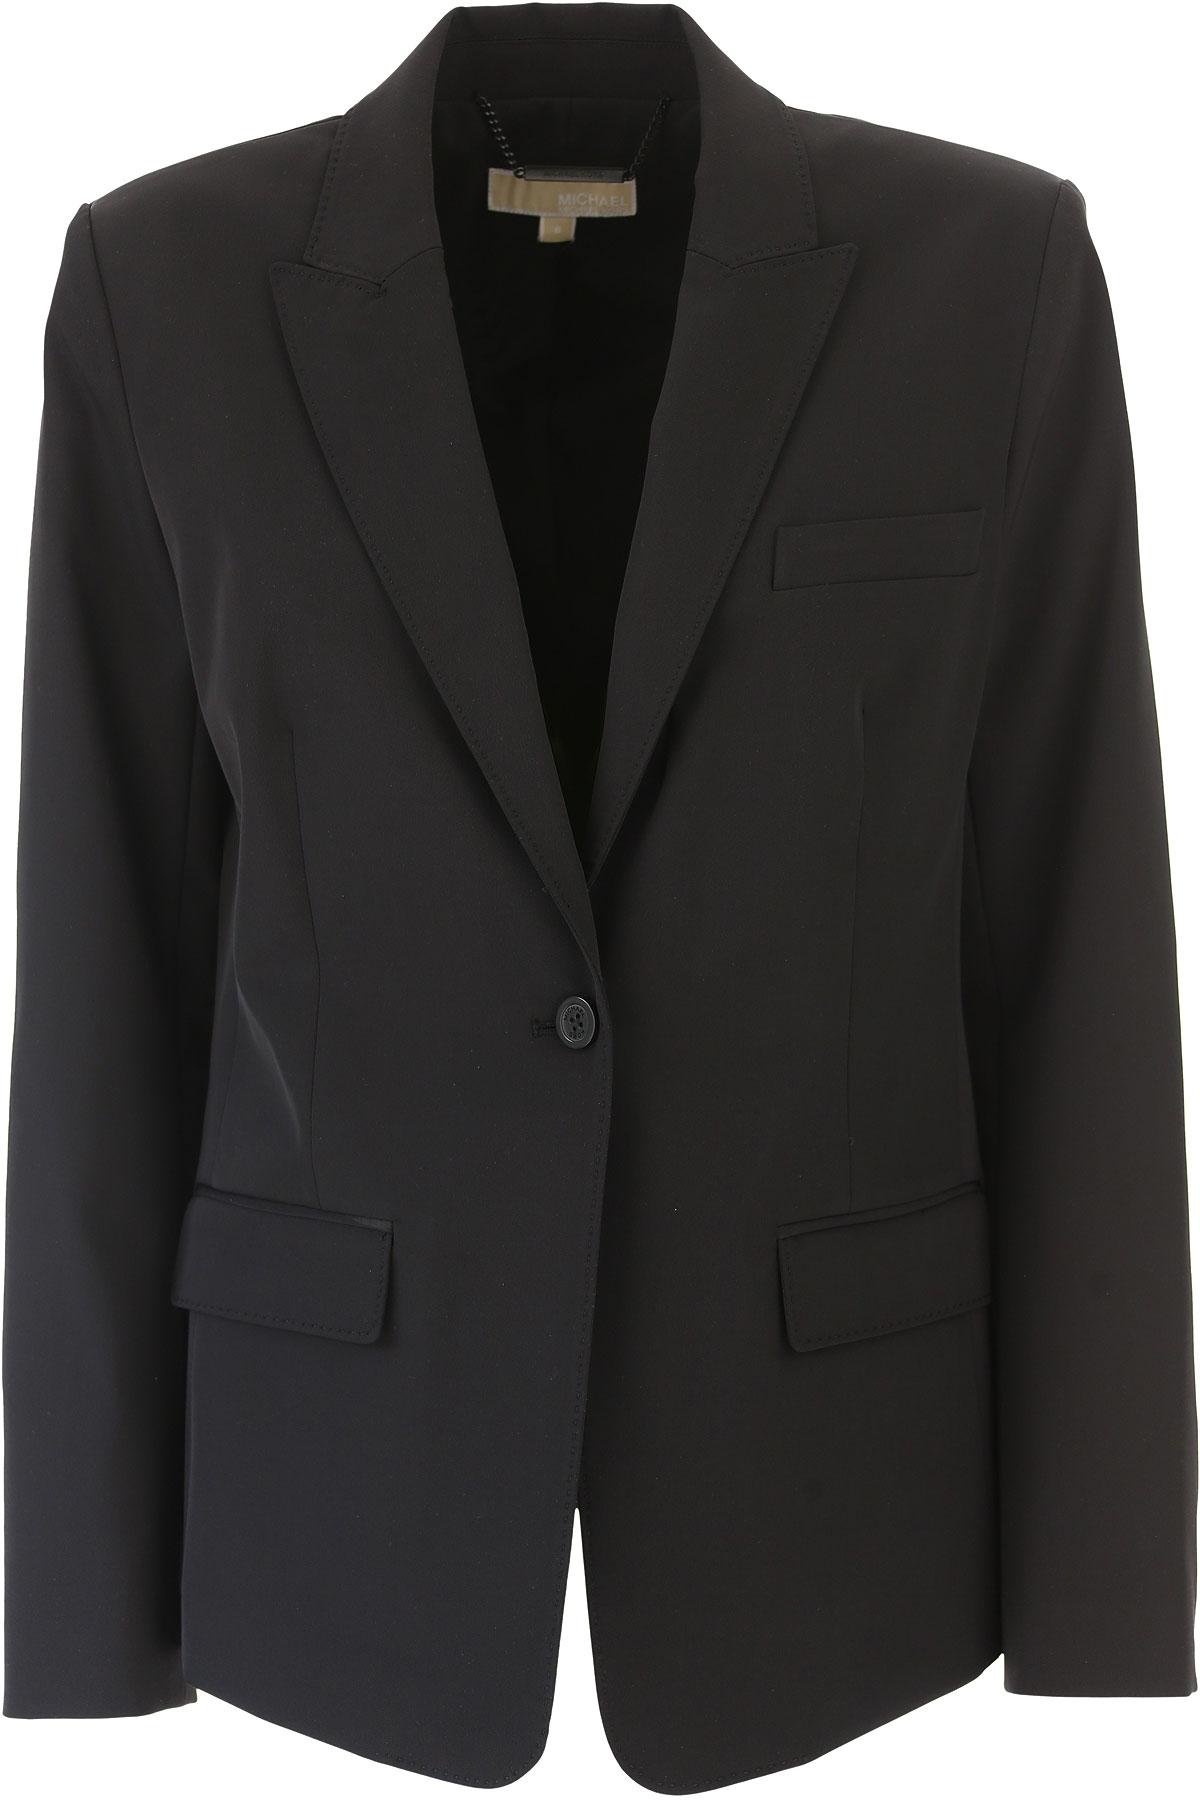 Michael Kors Blazer for Women On Sale in Outlet, Black, Cotton, 2019, IT 44 - US 6 - F 40 IT 46 - US 8 - F 42